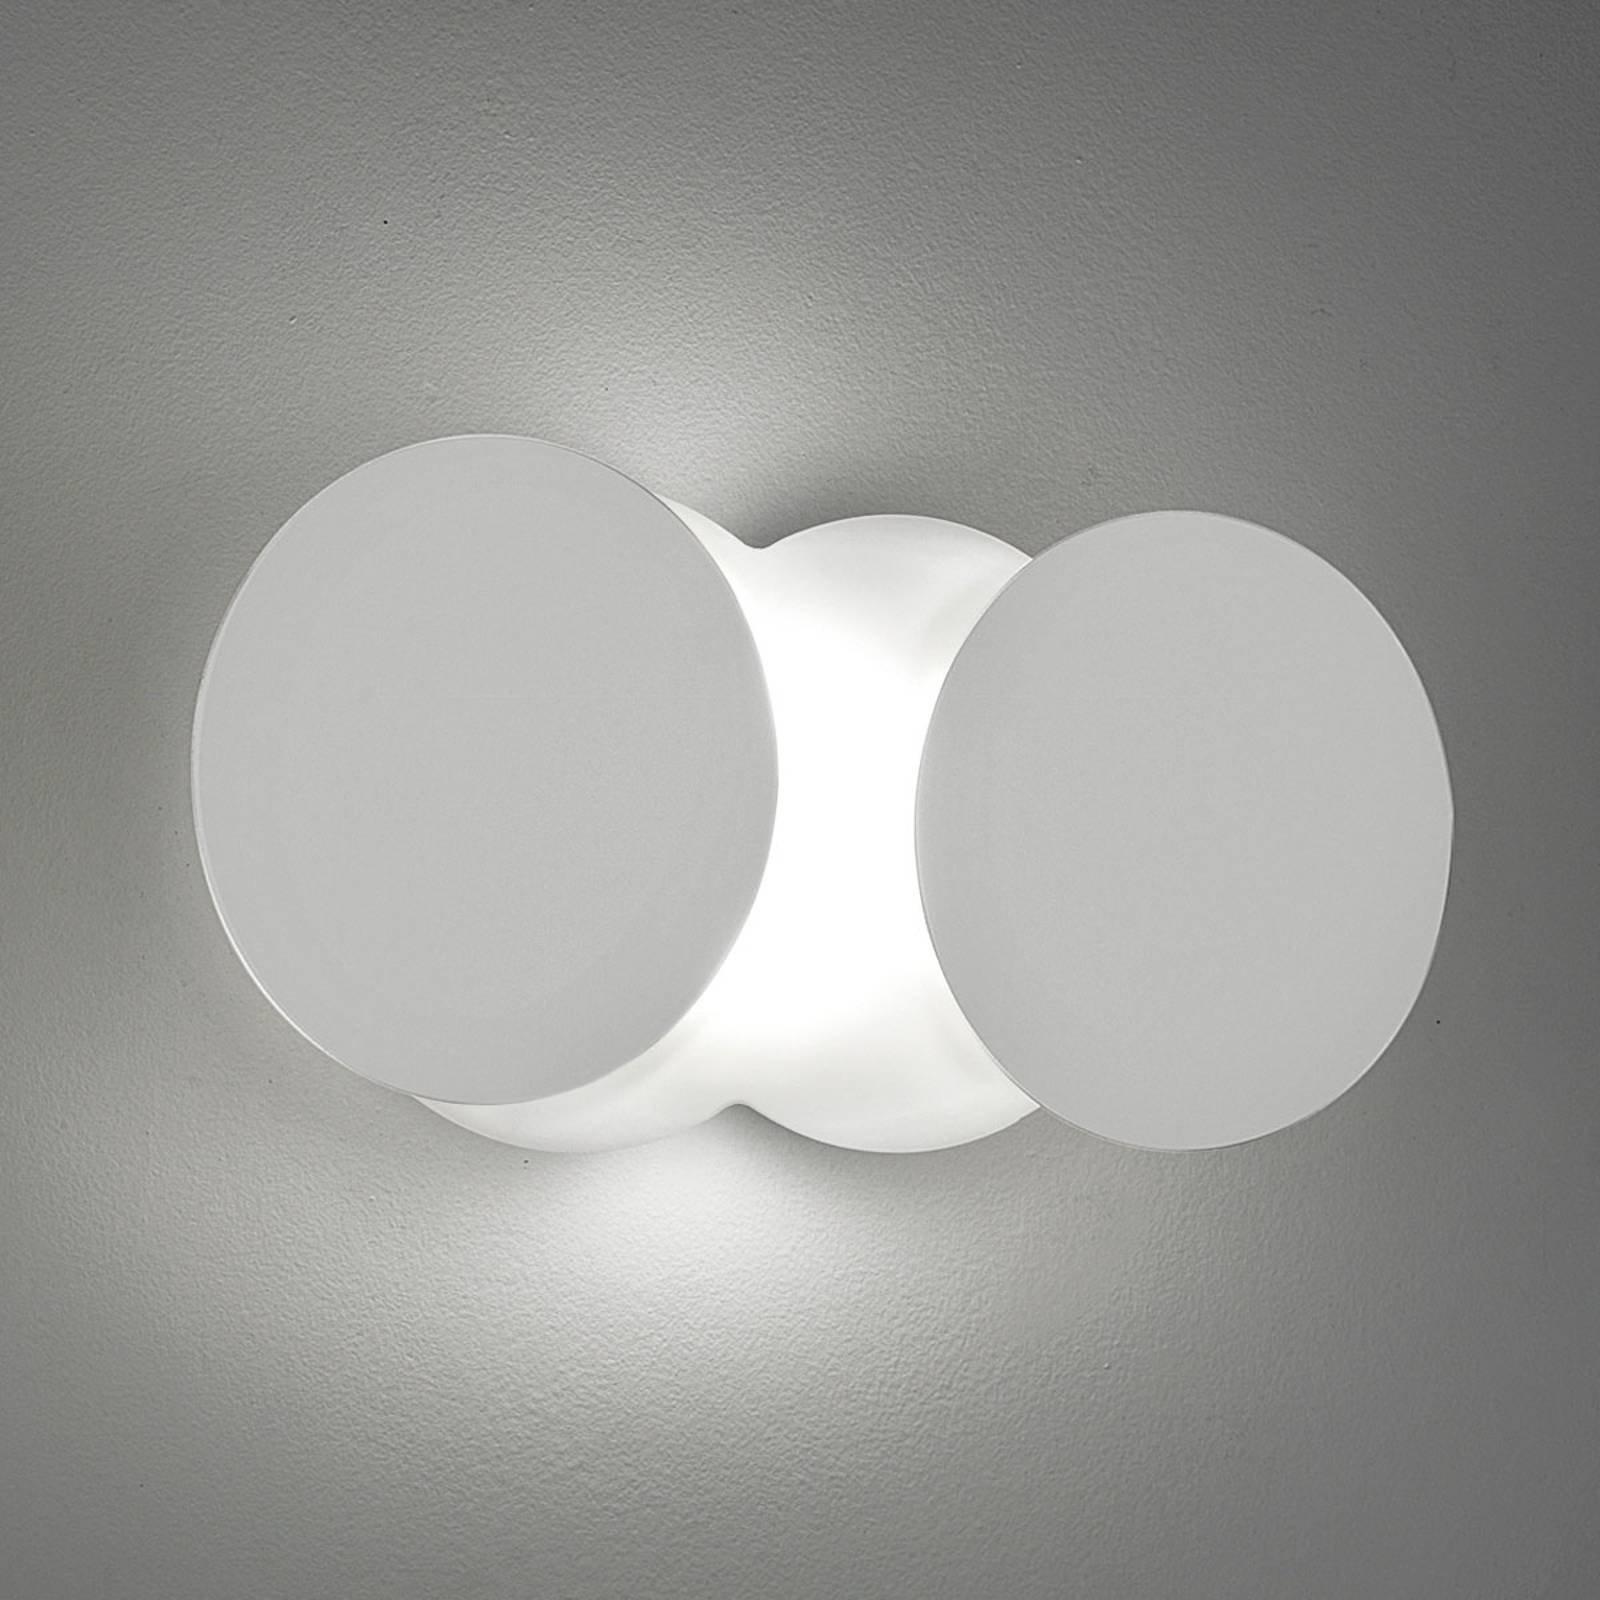 Foranderlig LED-vegglampe Nuvola, hvit